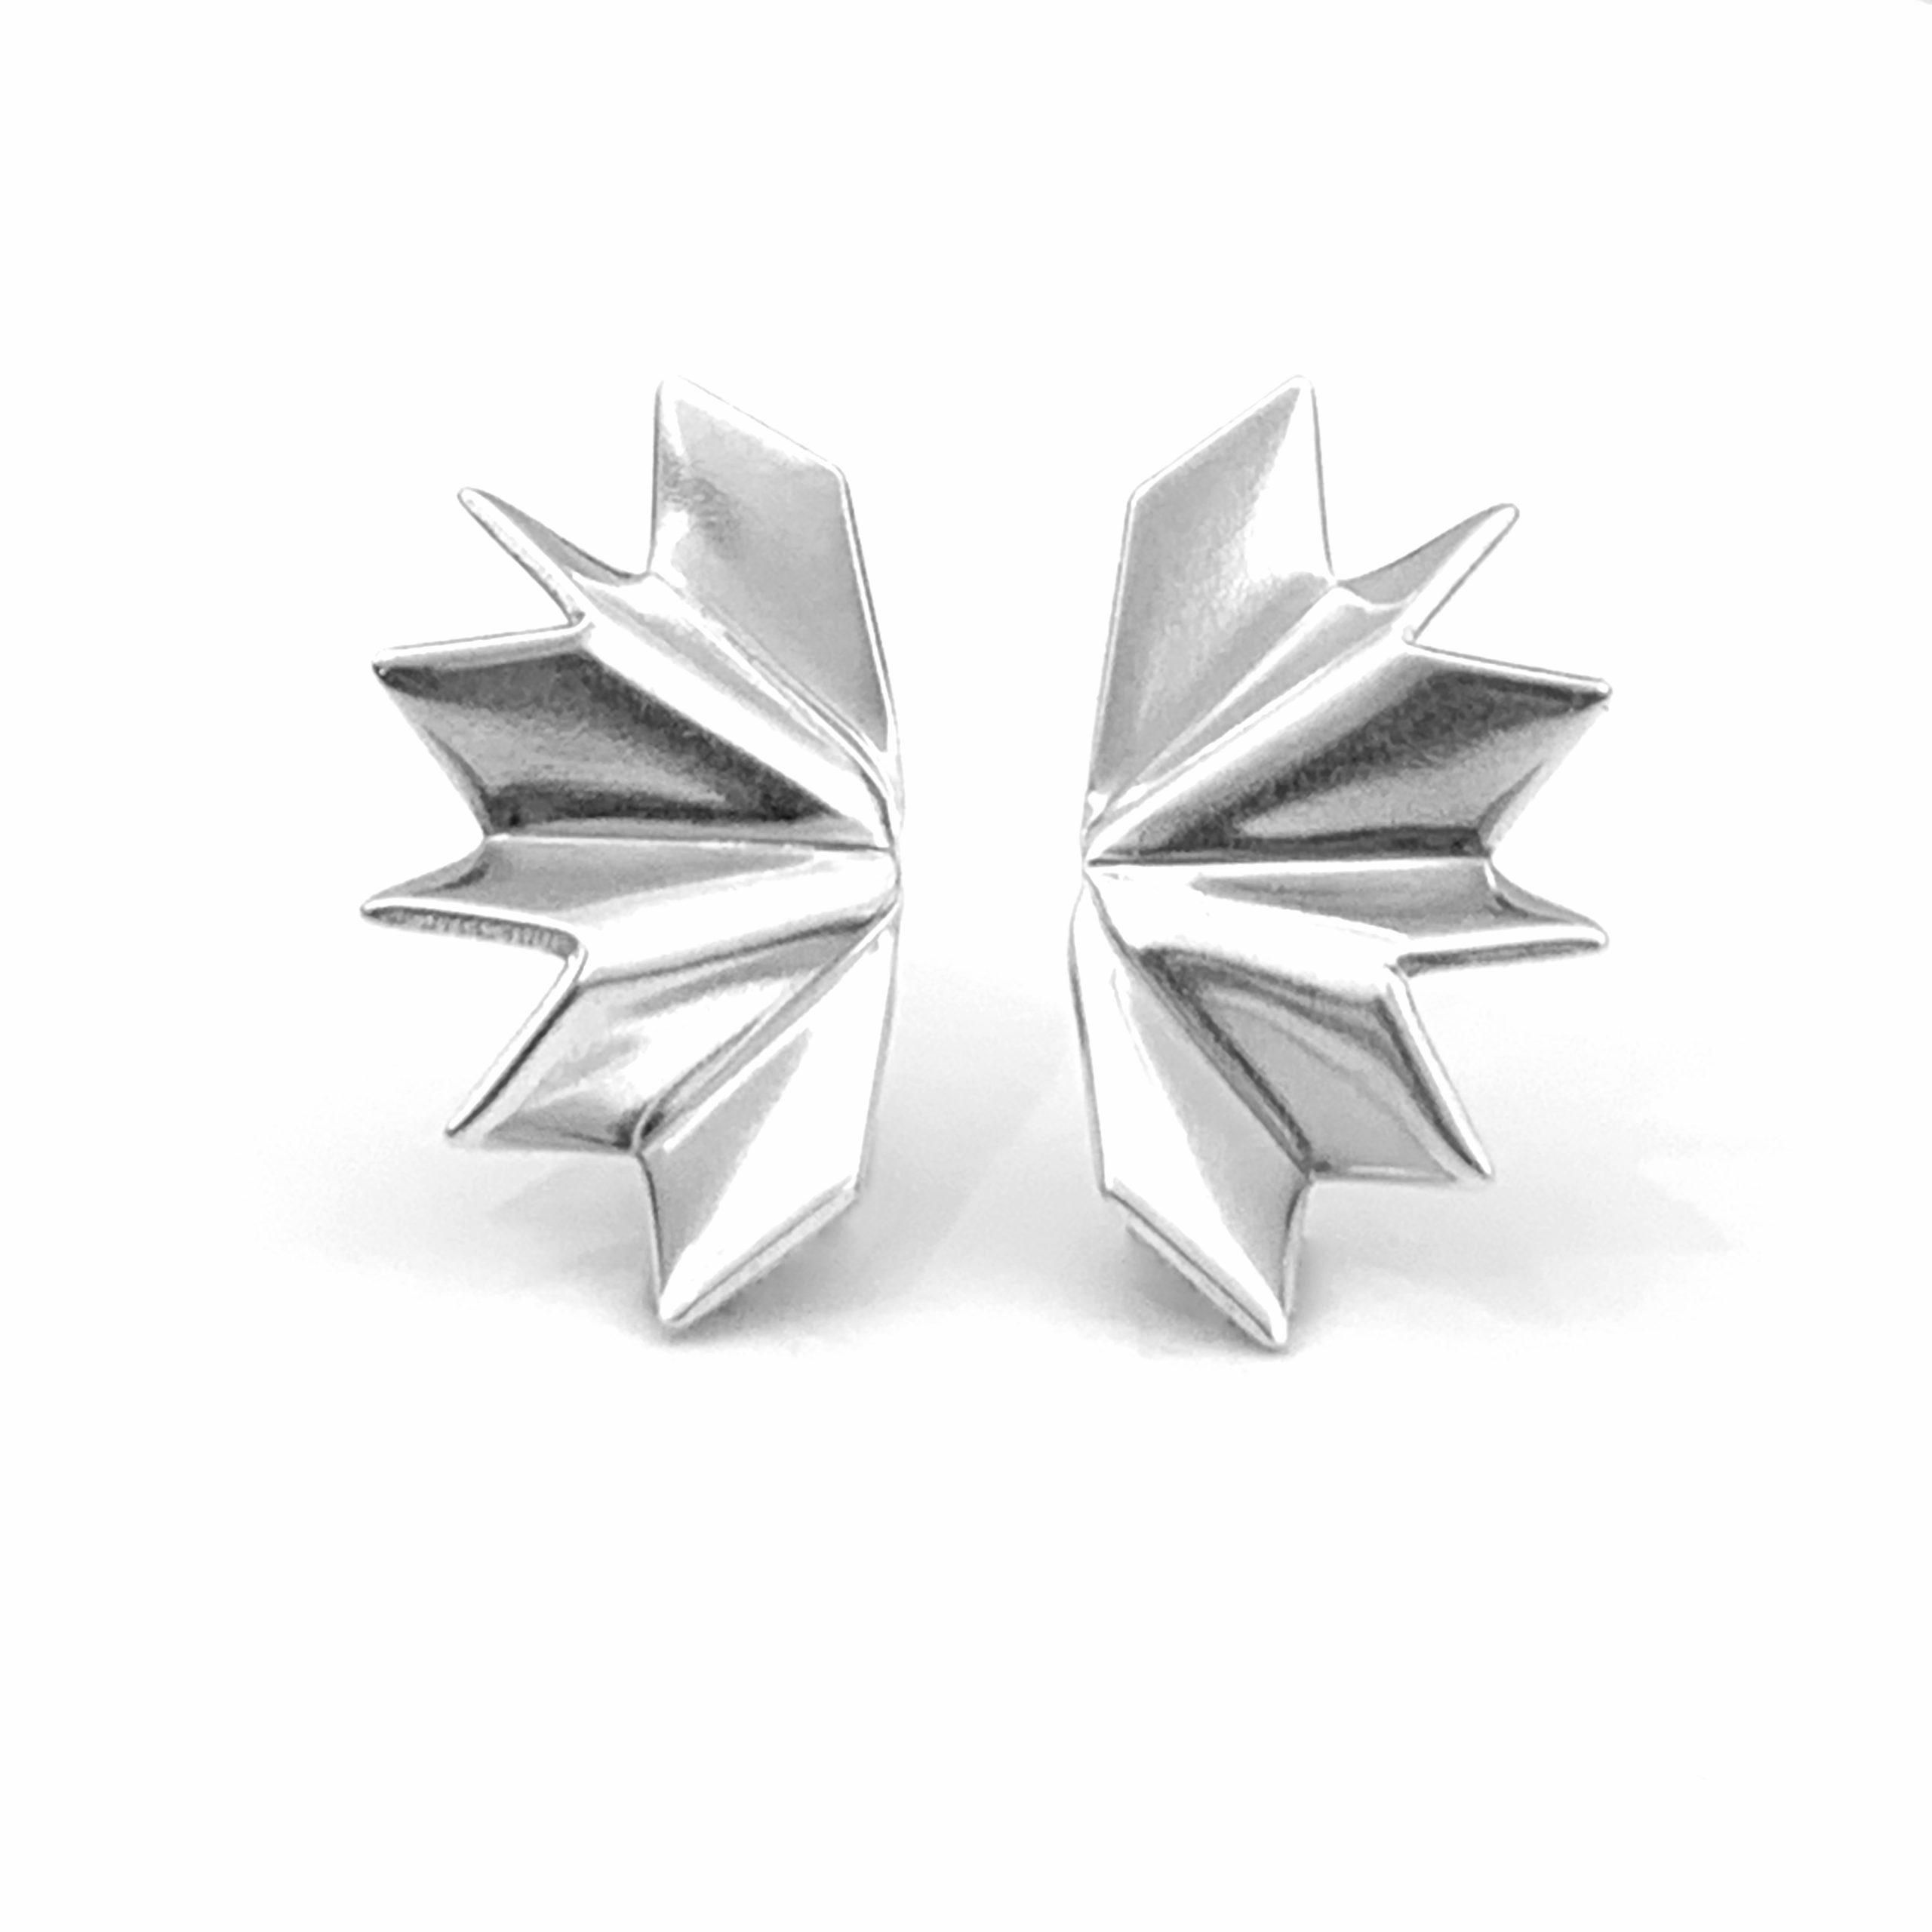 Unfolded silver studs